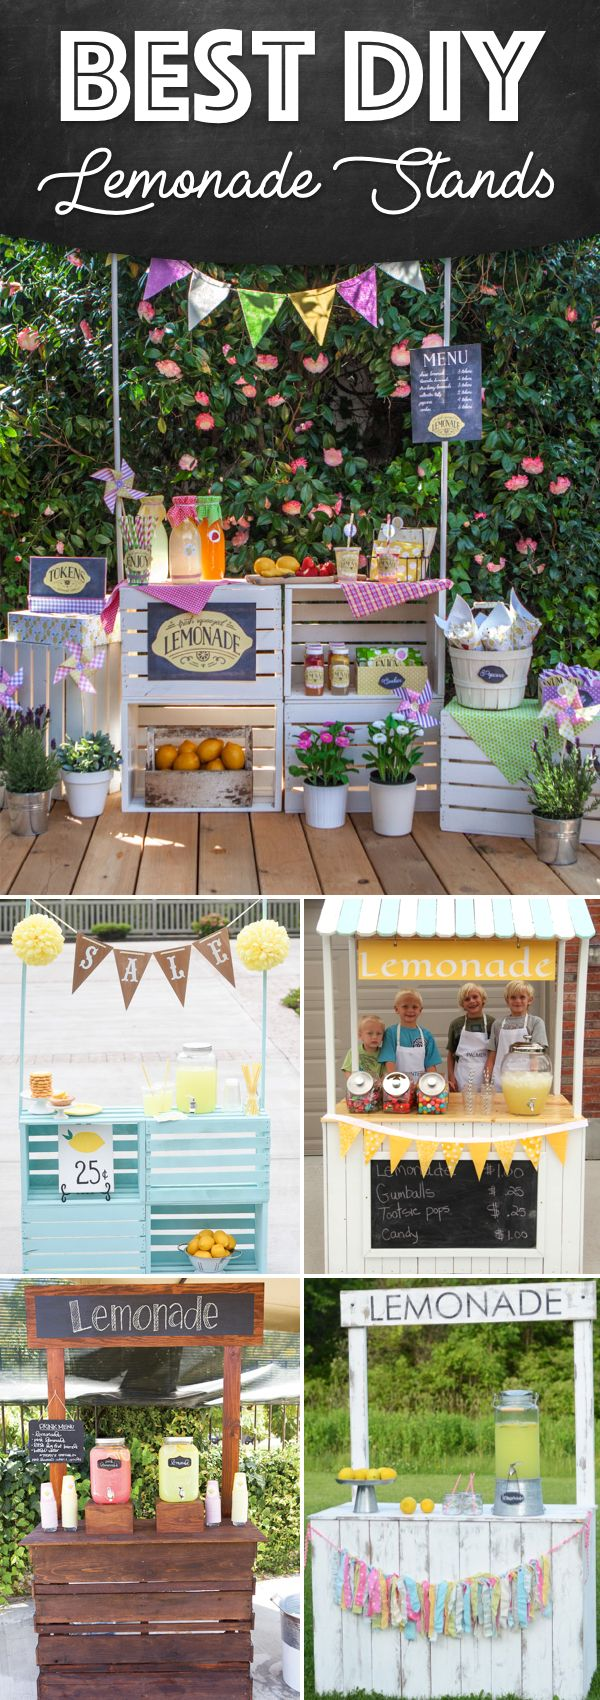 25 Effortless DIY Lemonade Stand Ideas Making Your Summer Parties Refreshing!